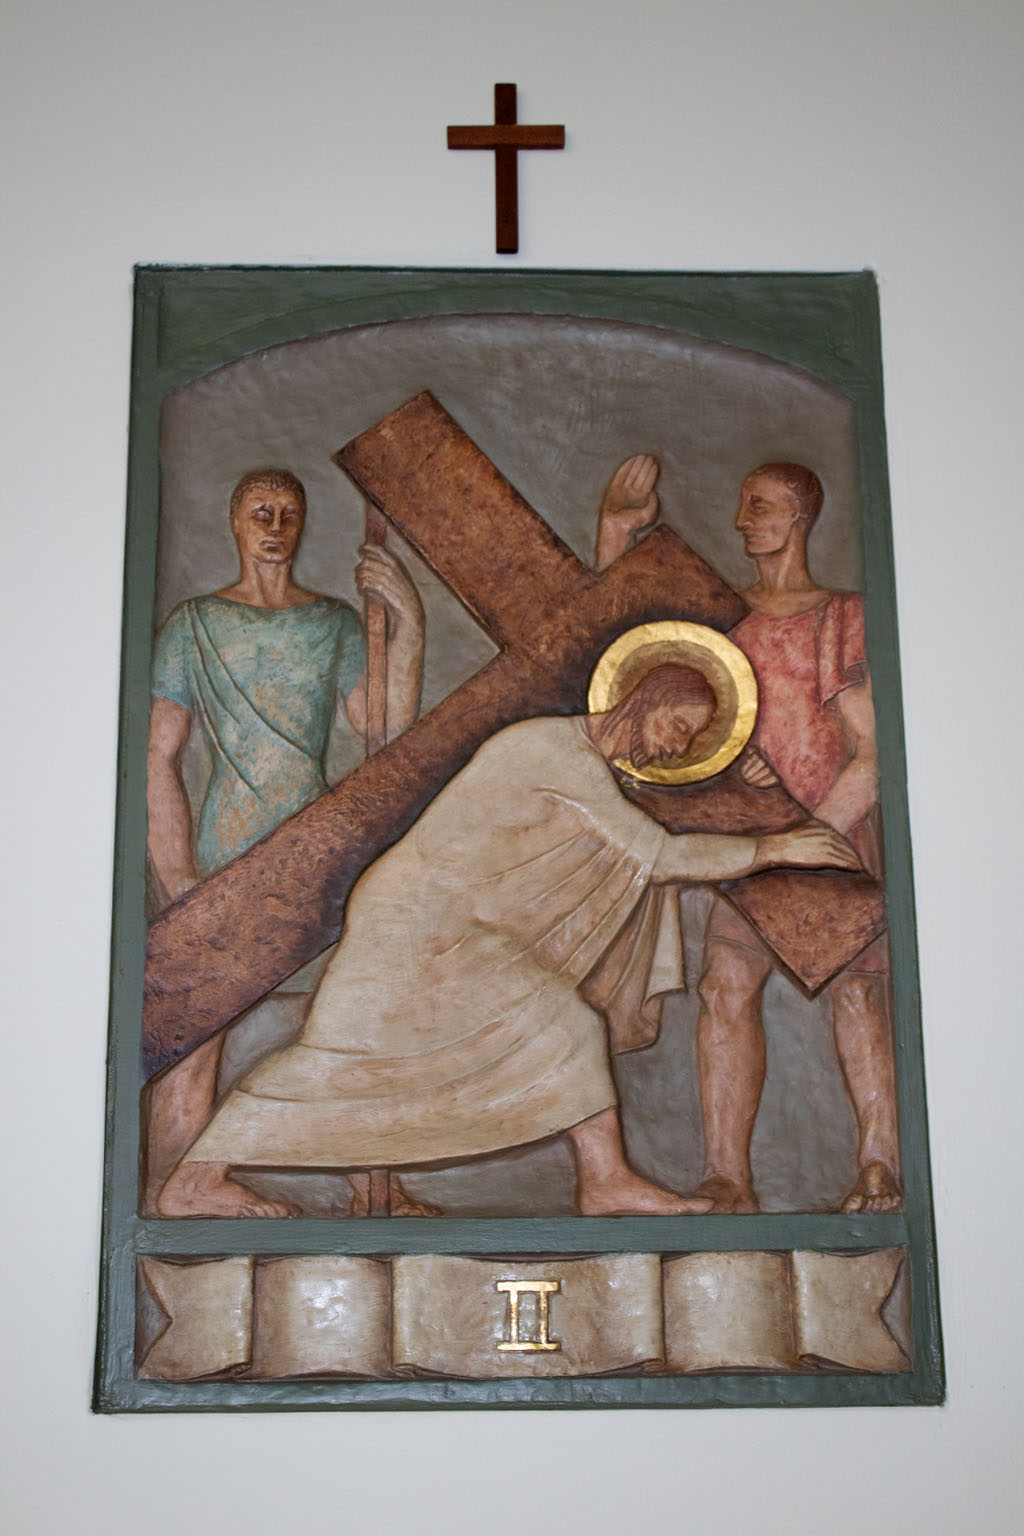 Second Station of the cross by Dora de Pédery Hunt